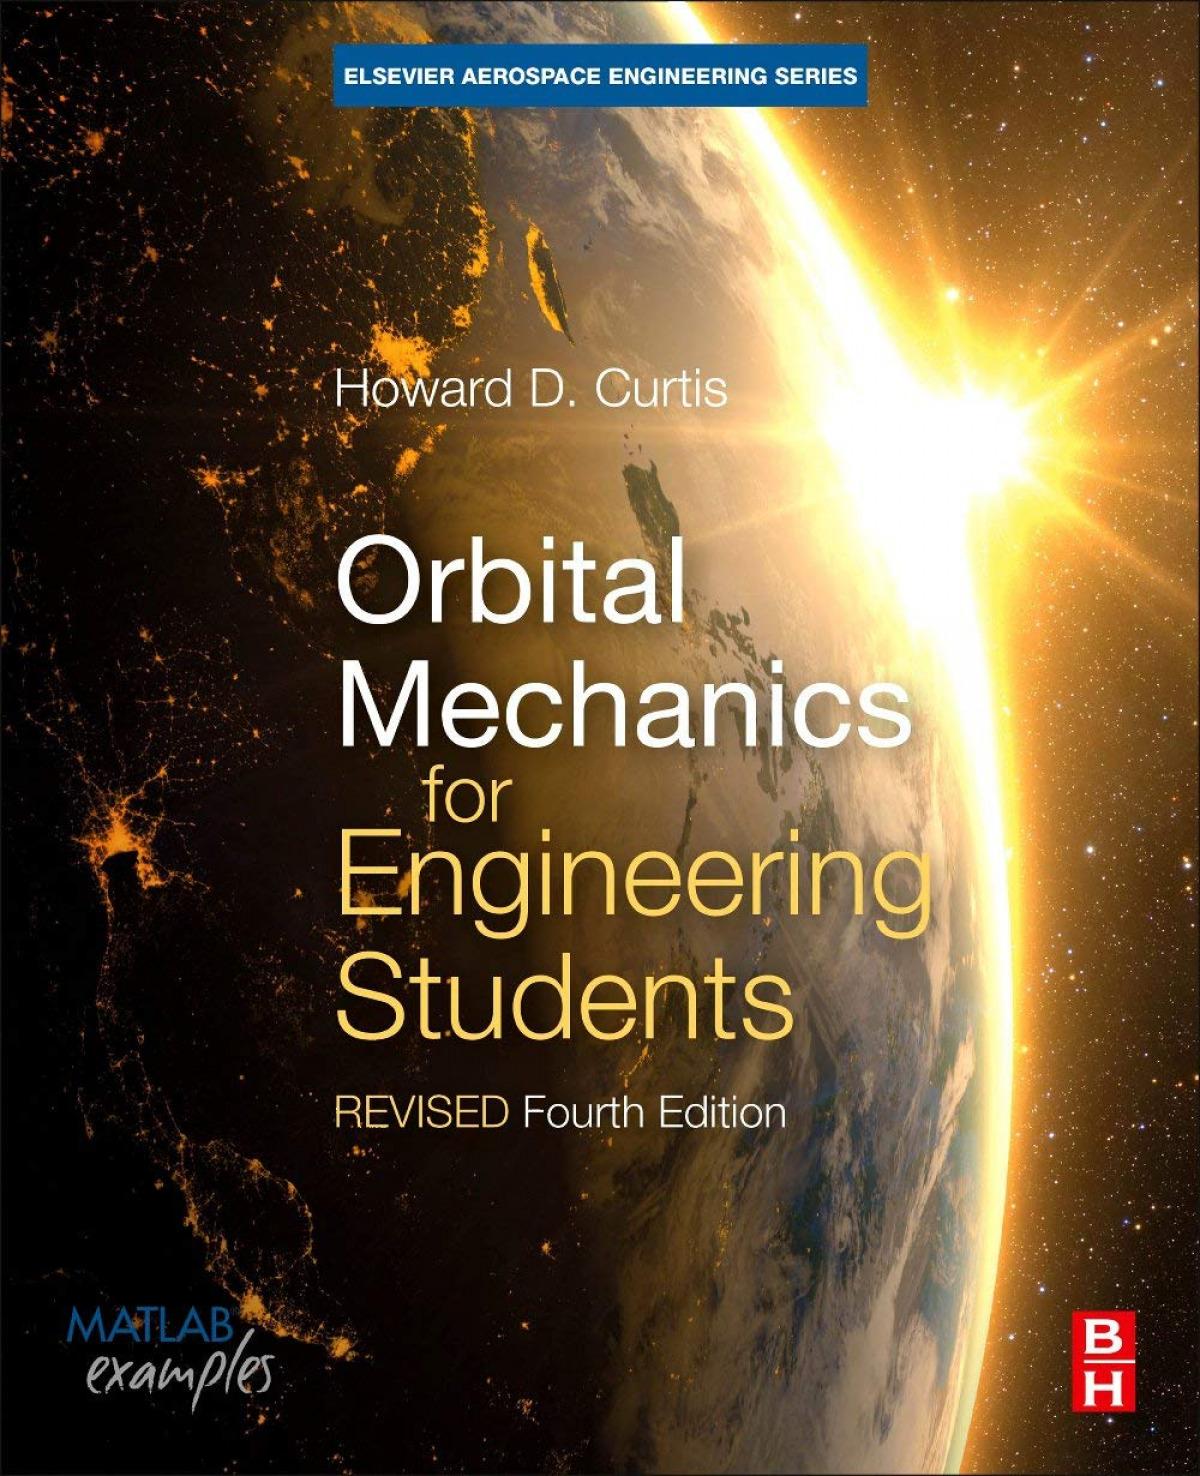 Orbital Mechanics for Engineering Students : Revised Reprint